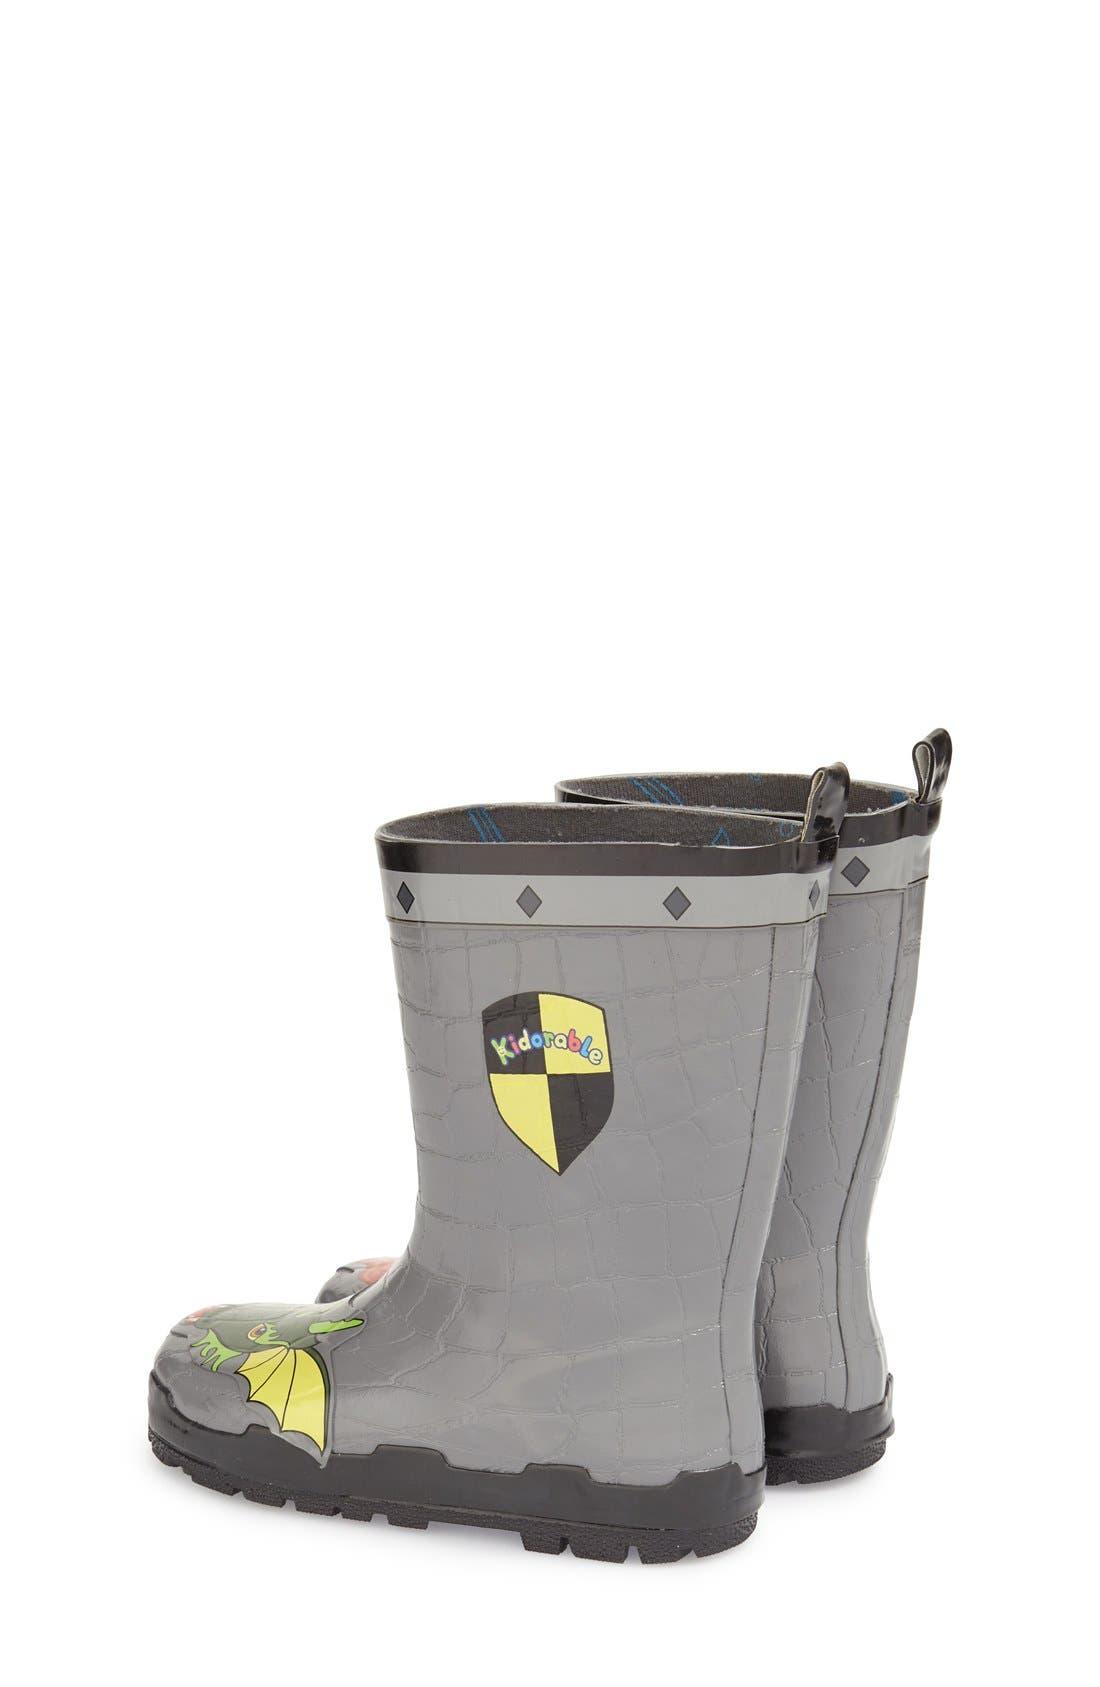 'Dragon Knight' Waterproof Rain Boot,                             Alternate thumbnail 2, color,                             020